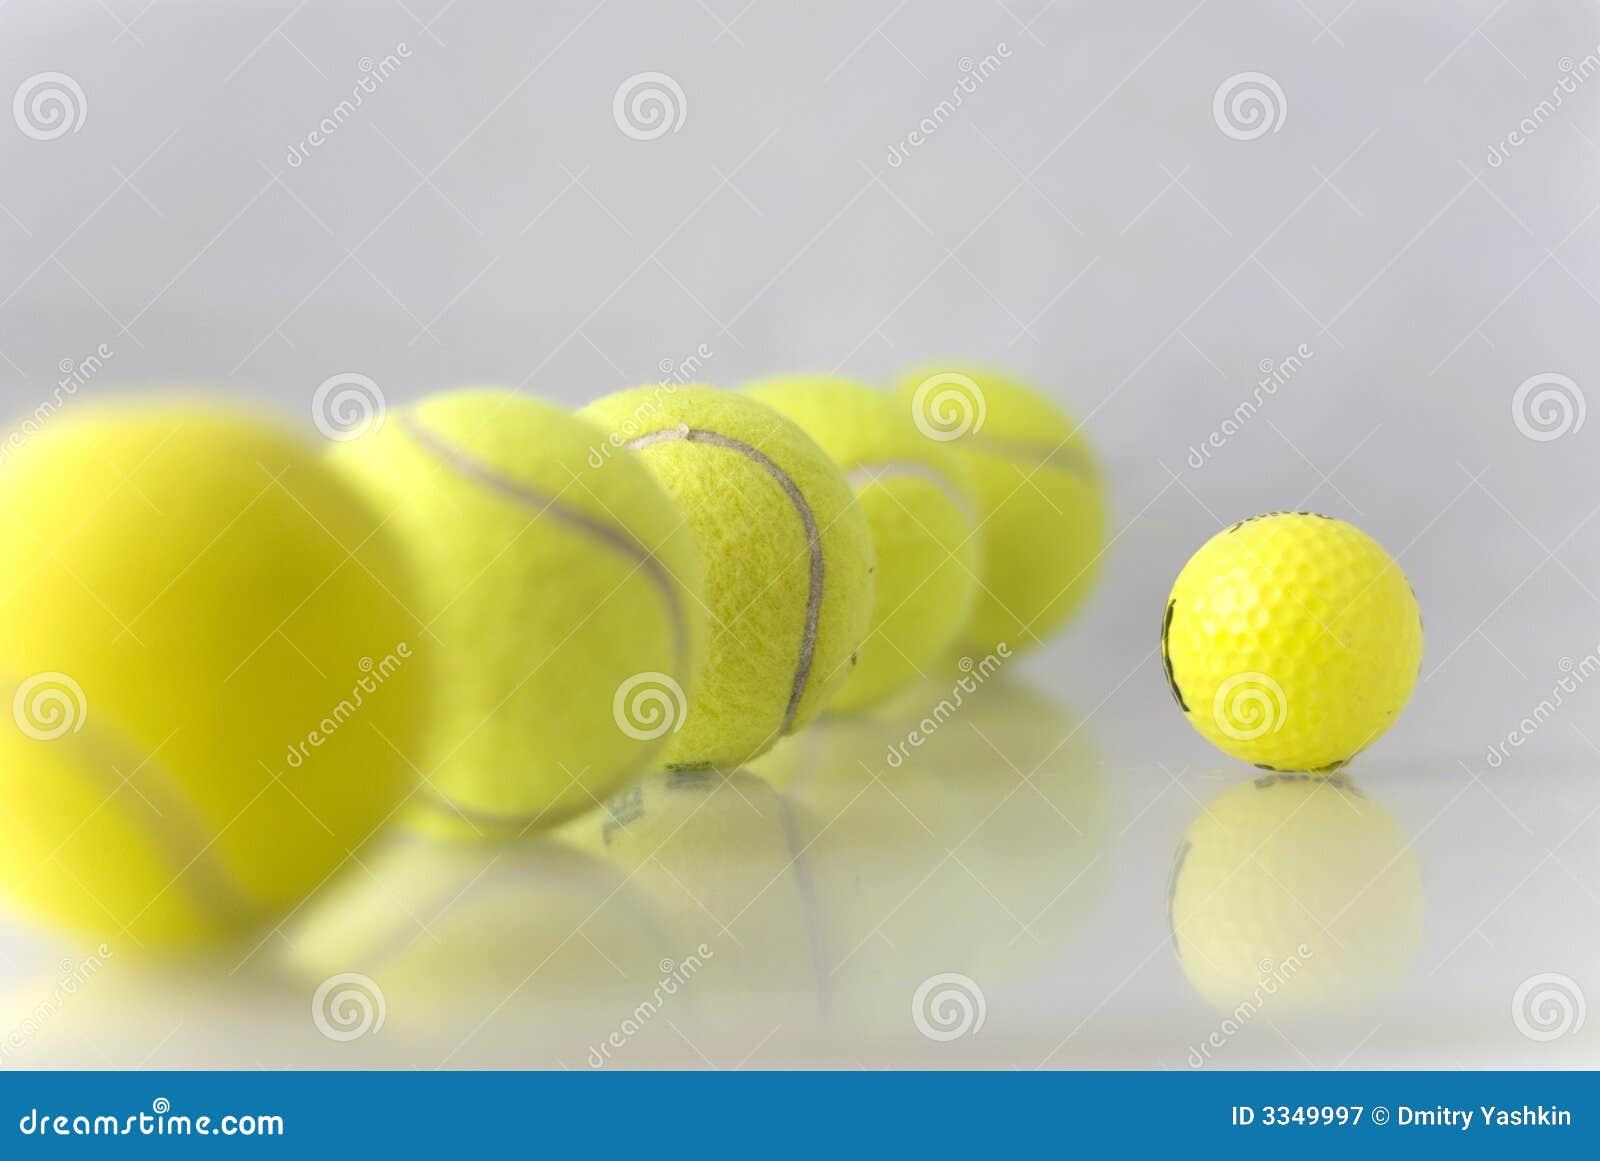 Five tennis balls